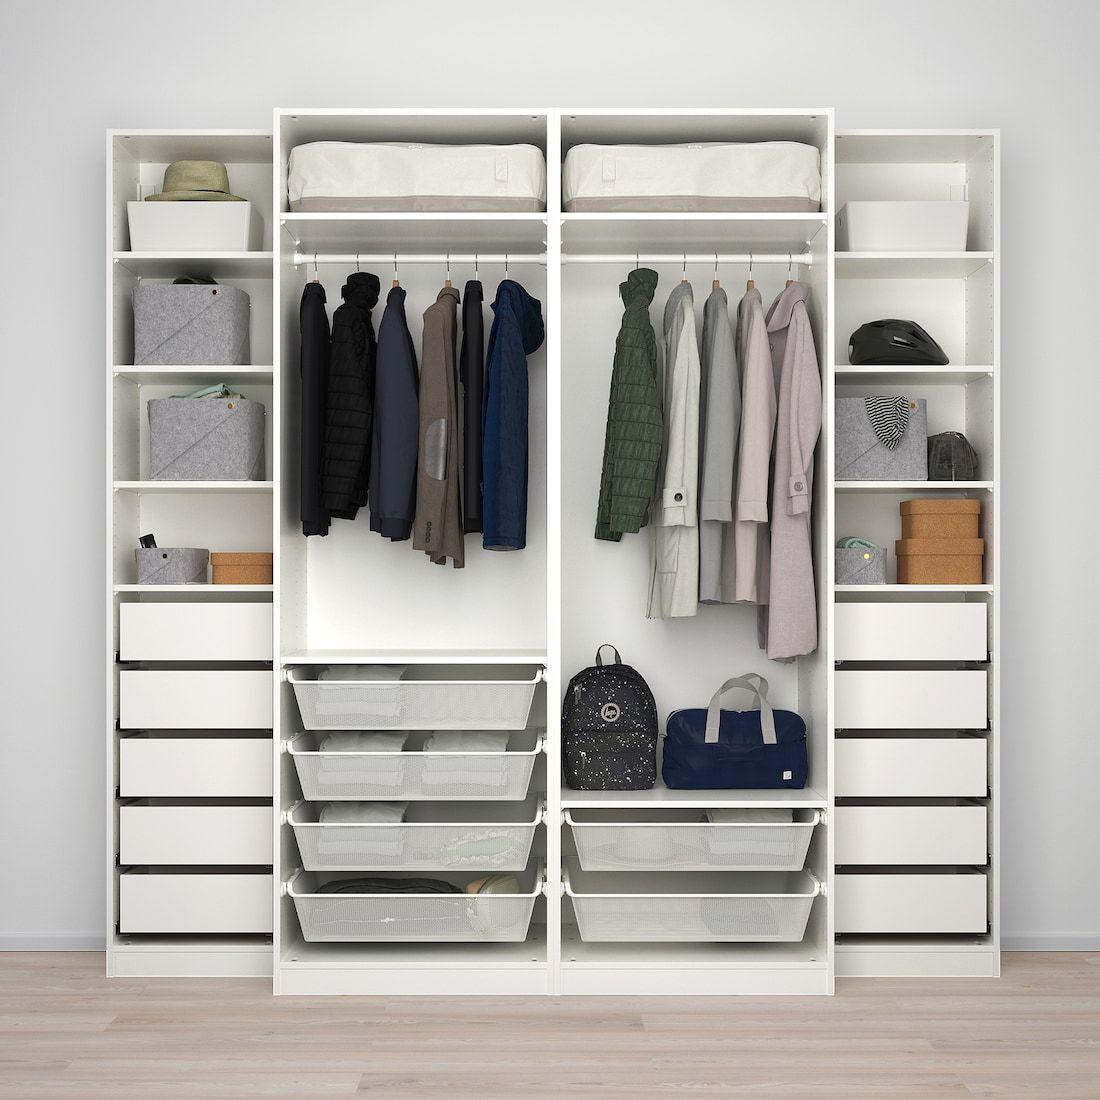 Pax Armario Blanco Mehamn Auli 250x66x236 Cm Ikea In 2020 Pax Wardrobe Ikea Pax Bedroom Built In Wardrobe